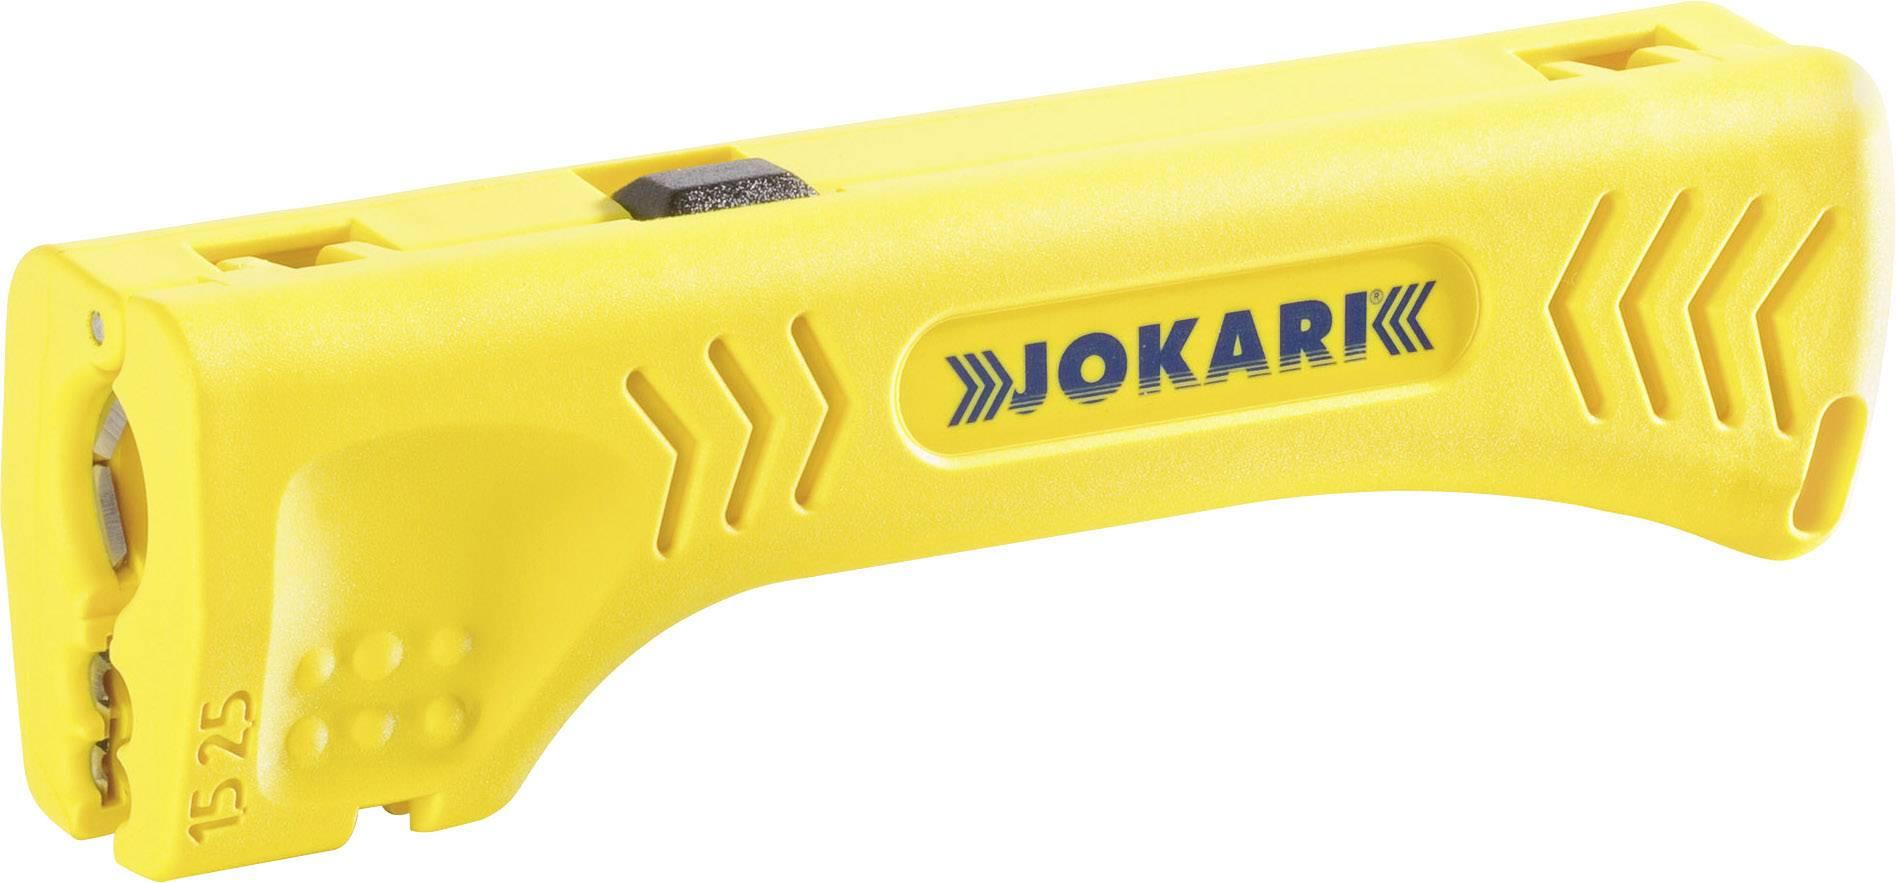 Odizolovač Jokari Uni-Plus 30400, 8 do 15 mm, 1.5 do 2.5 mm²